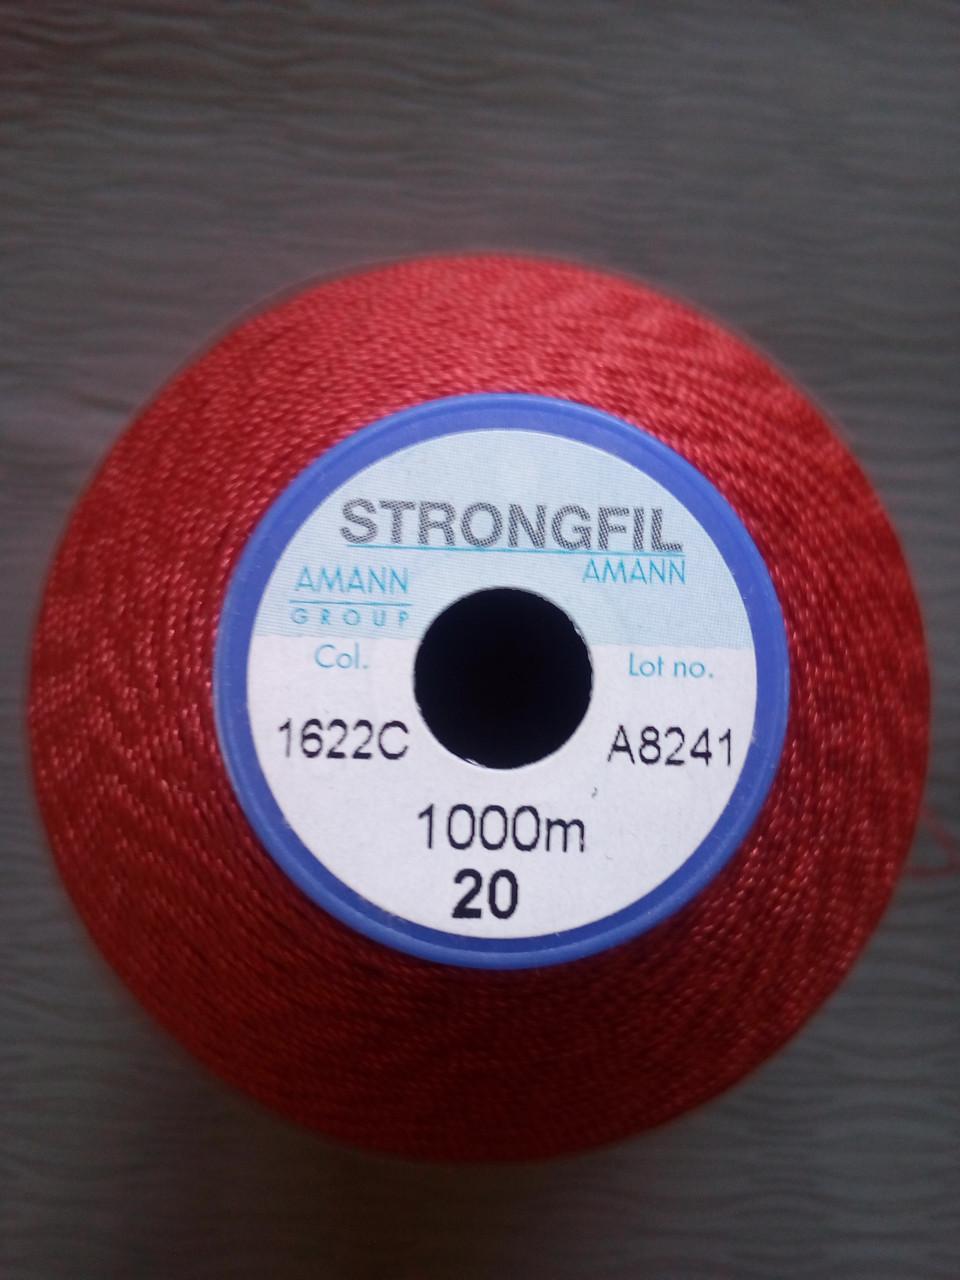 Amann Strongfil  №20.  цвет  КРАСНЫЙ.  1000 м